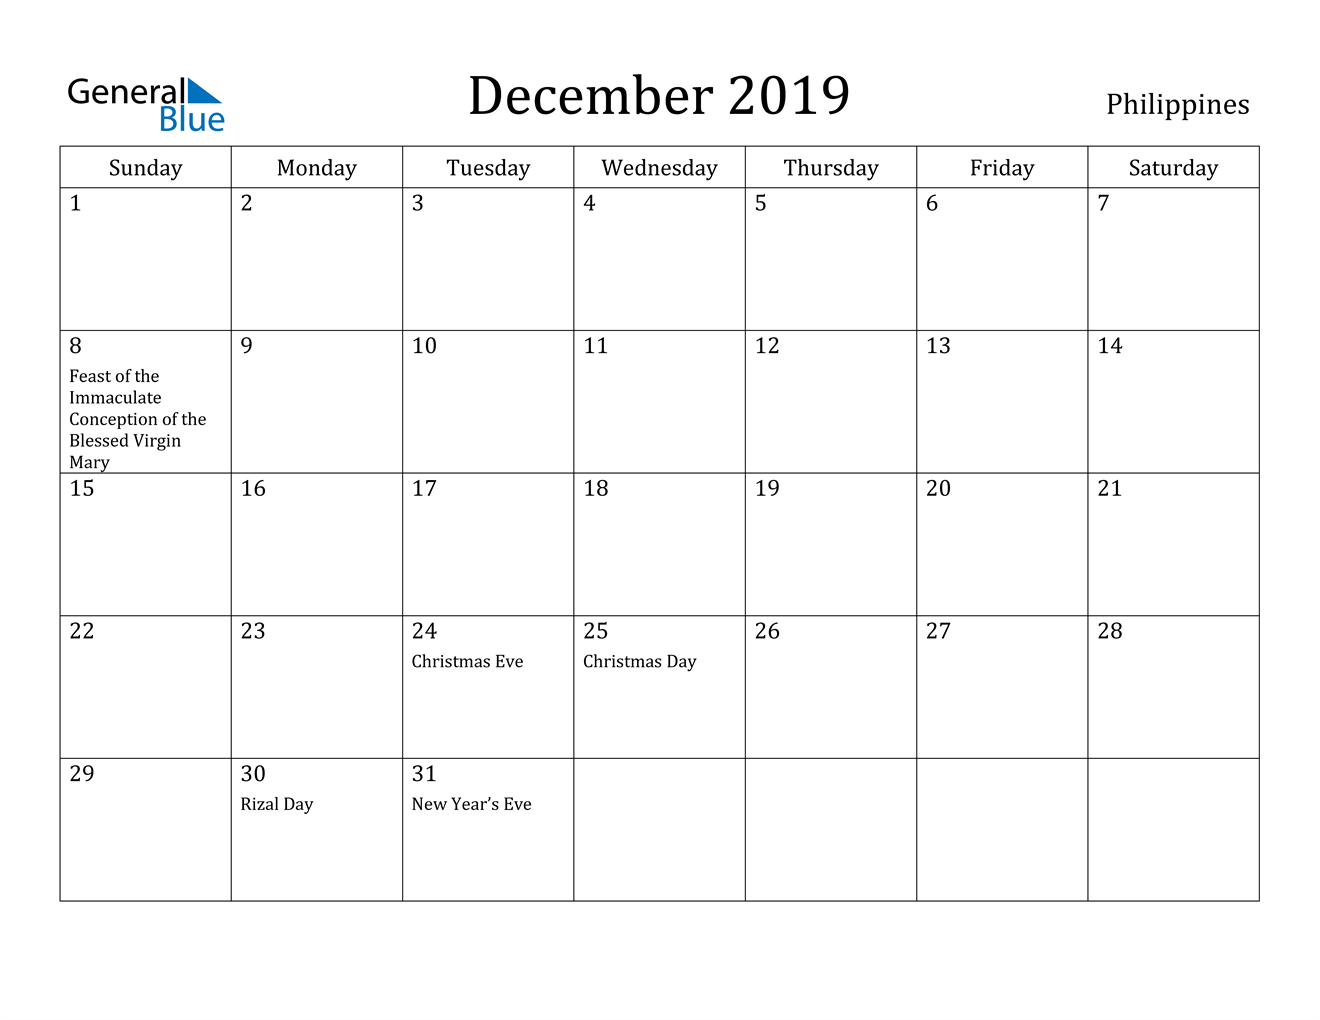 Image of December 2019 Philippines Calendar with Holidays Calendar